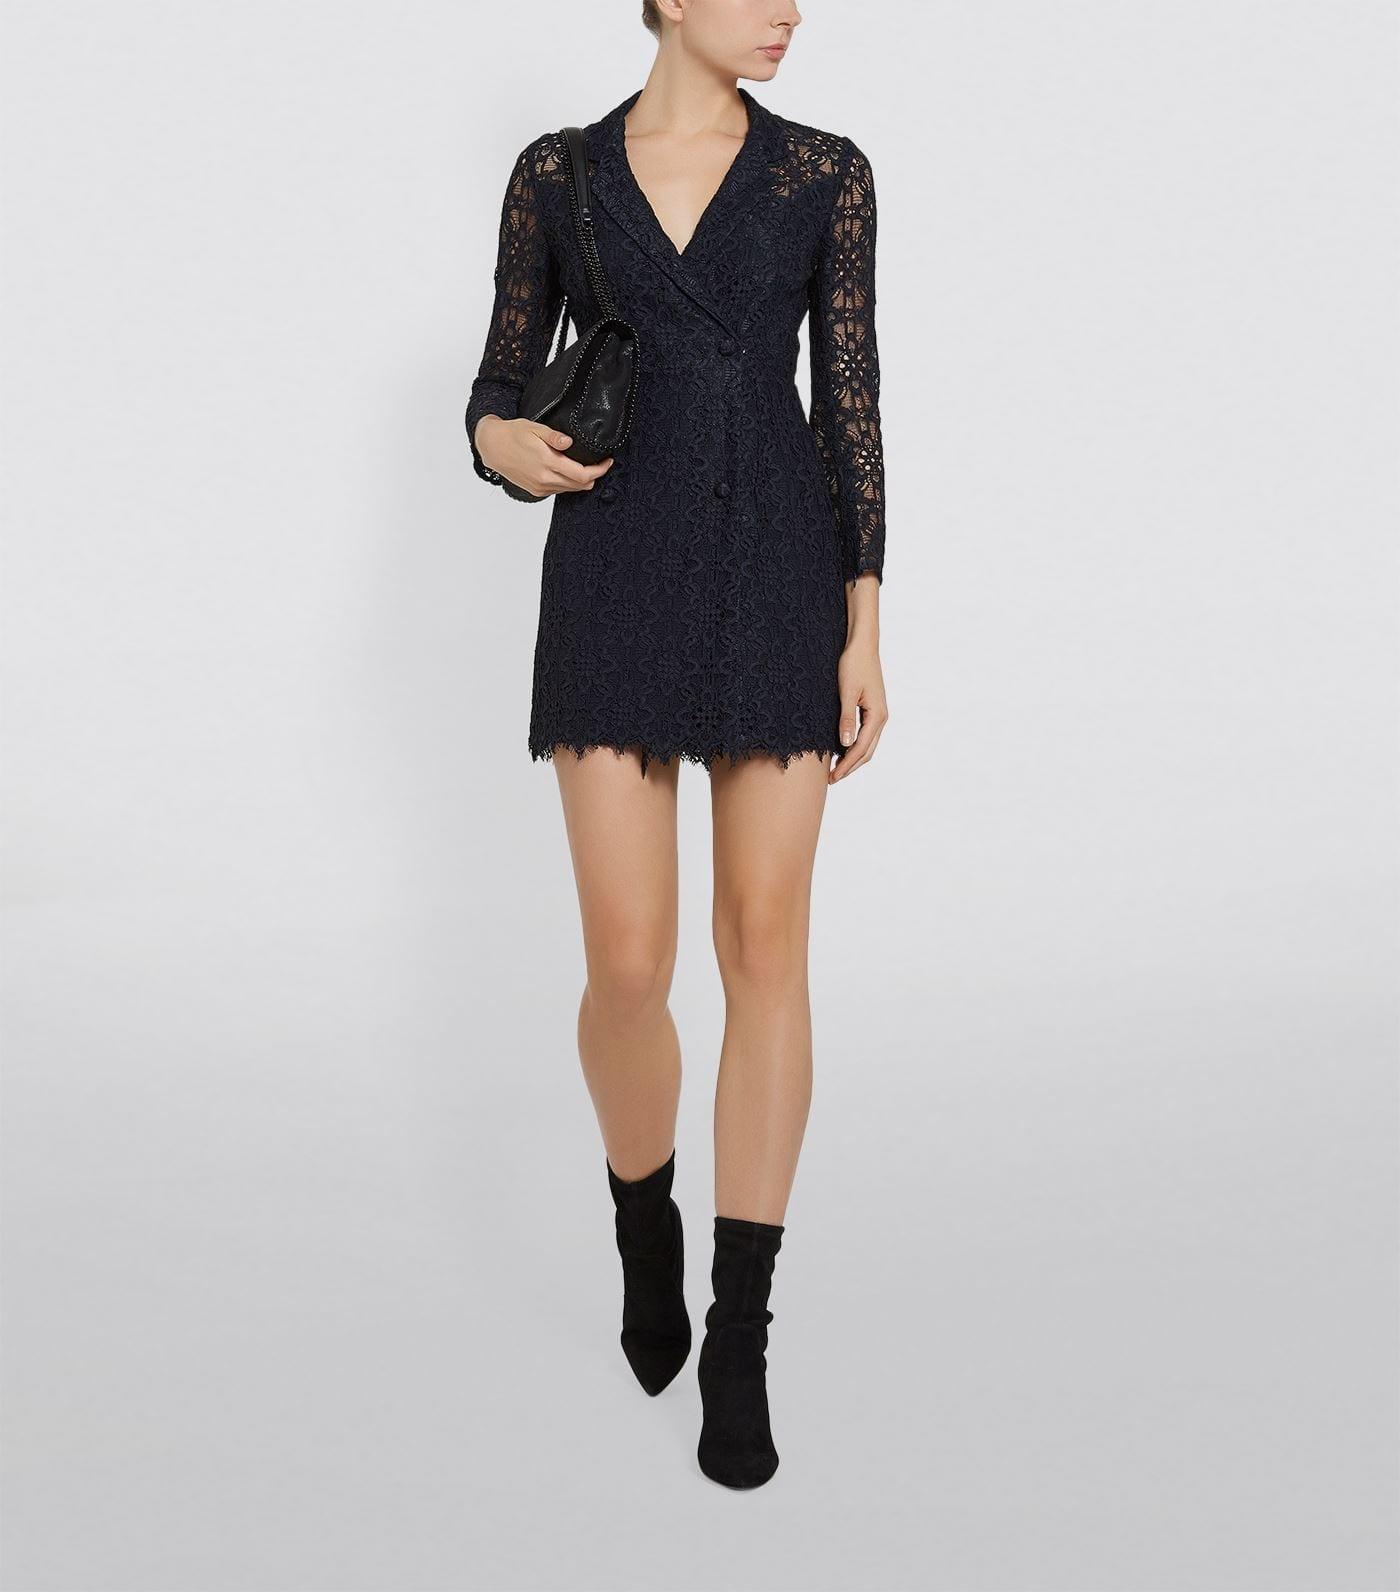 SANDRO Lace Blazer Dress